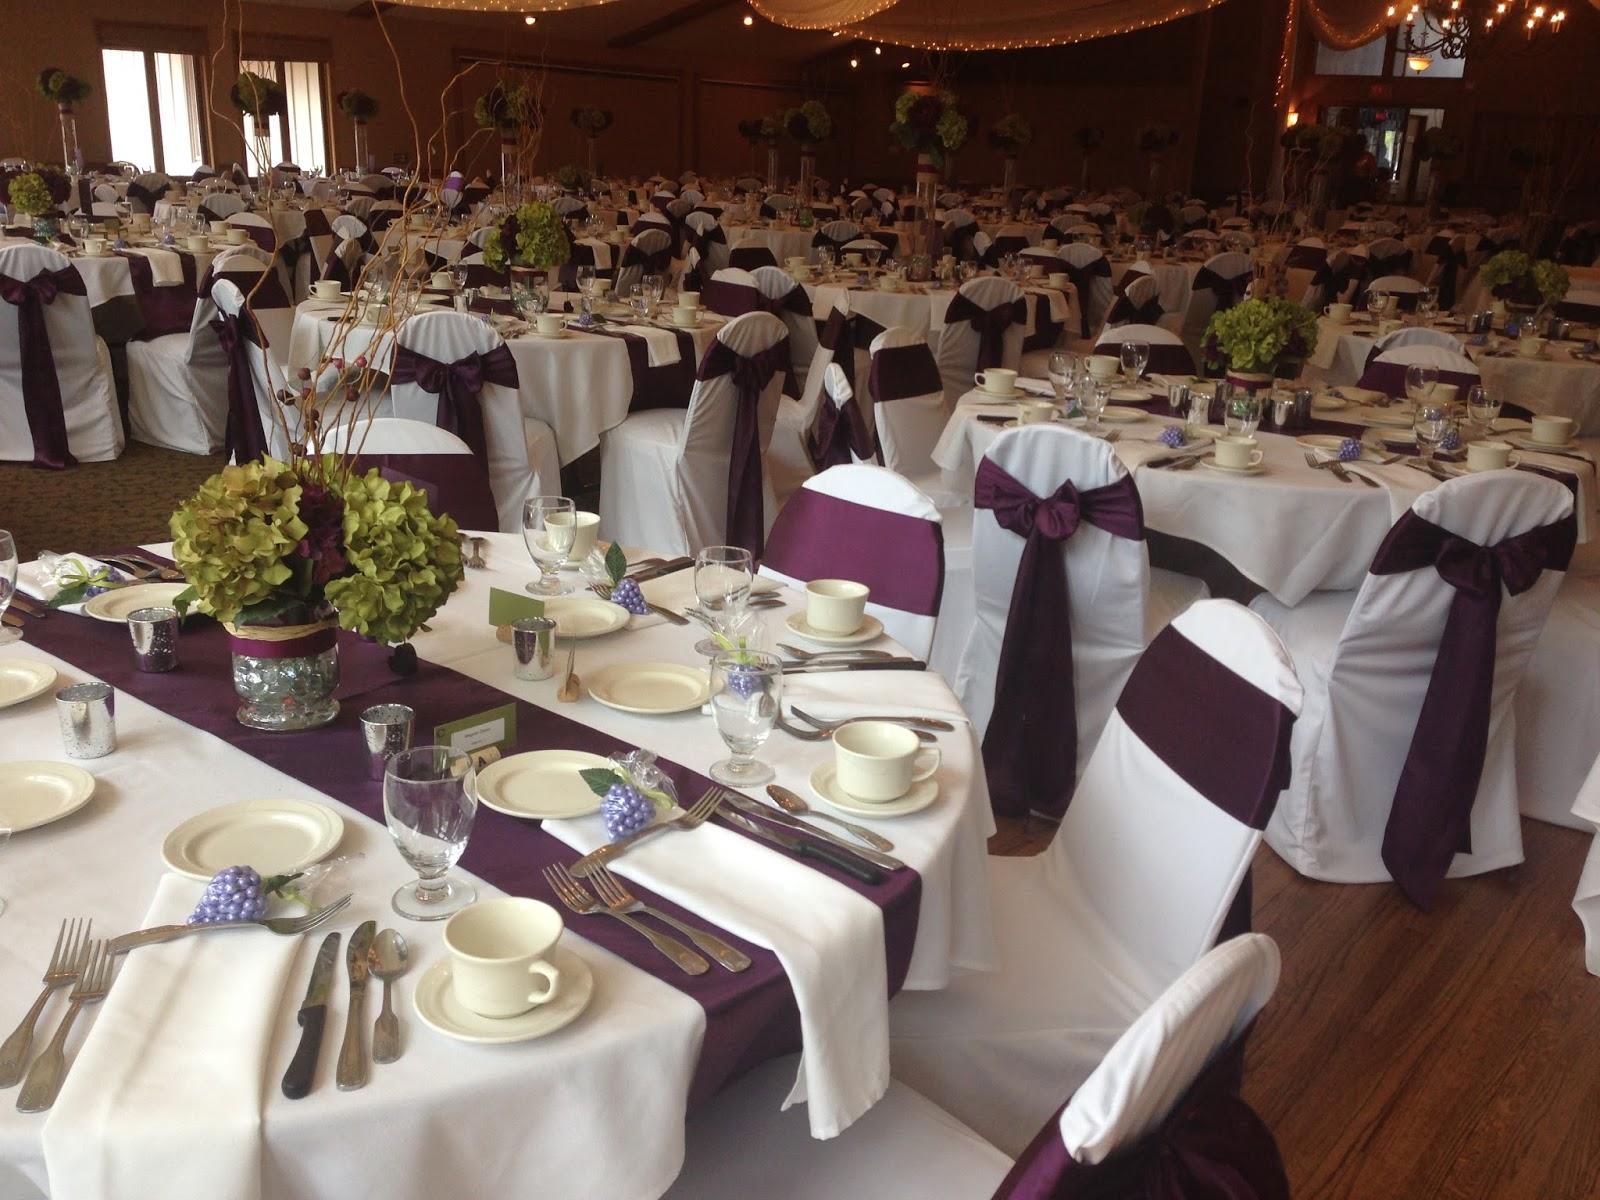 bella amore events blog majestic oaks golf club wedding reception andover mn. Black Bedroom Furniture Sets. Home Design Ideas